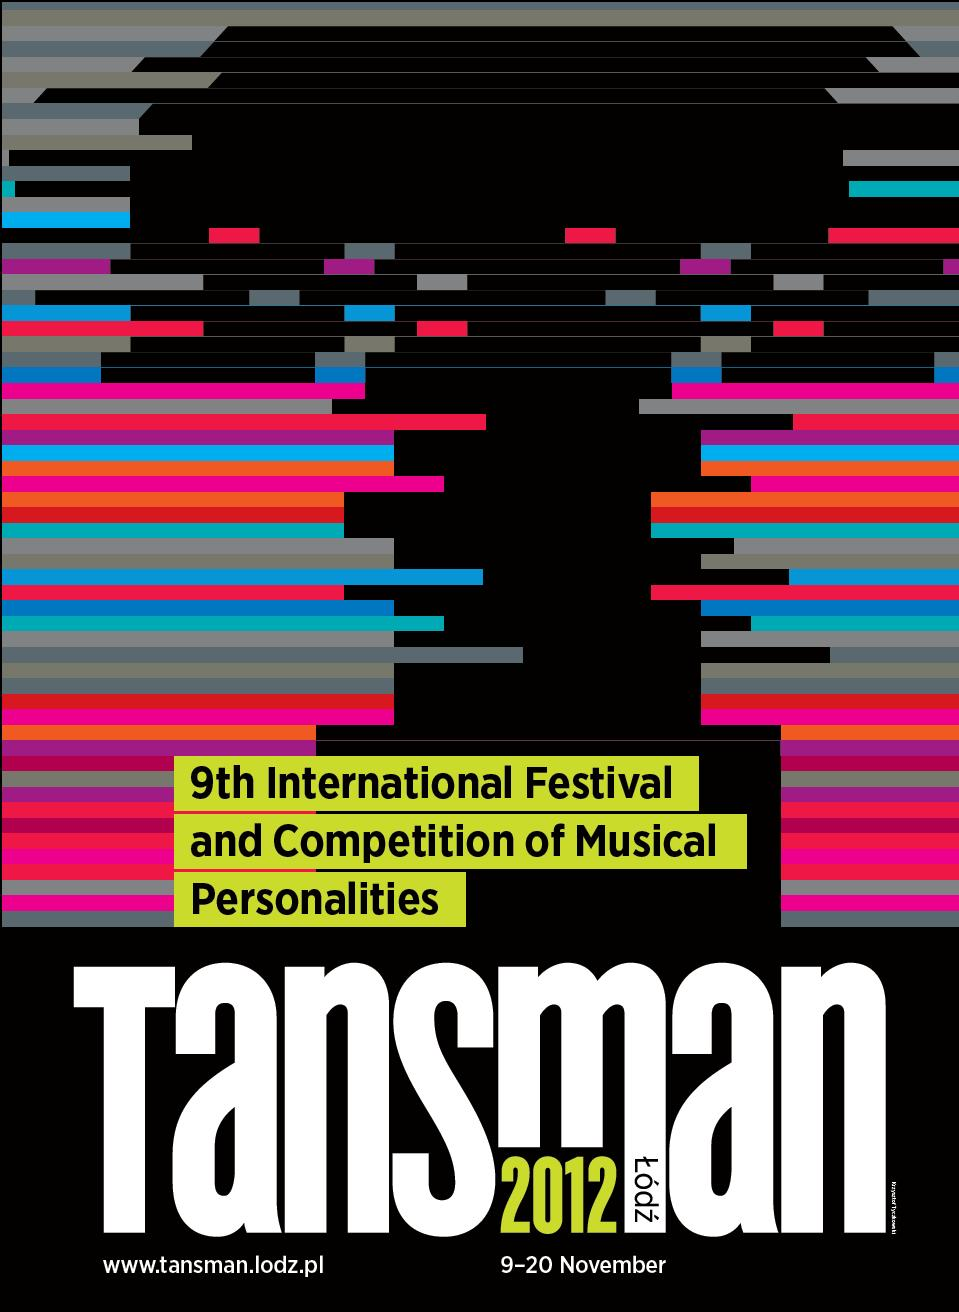 TANSMAN_2012_graphic